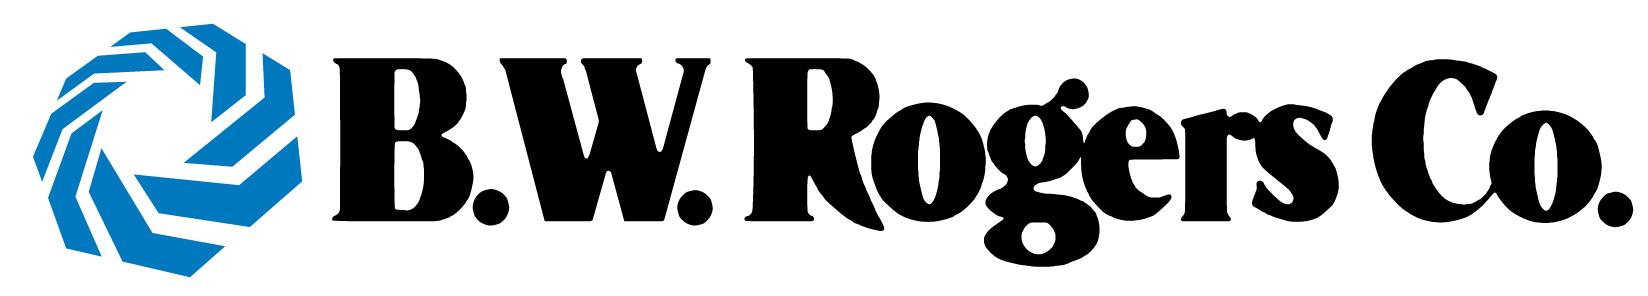 logo-bw-rogers-bb.jpg